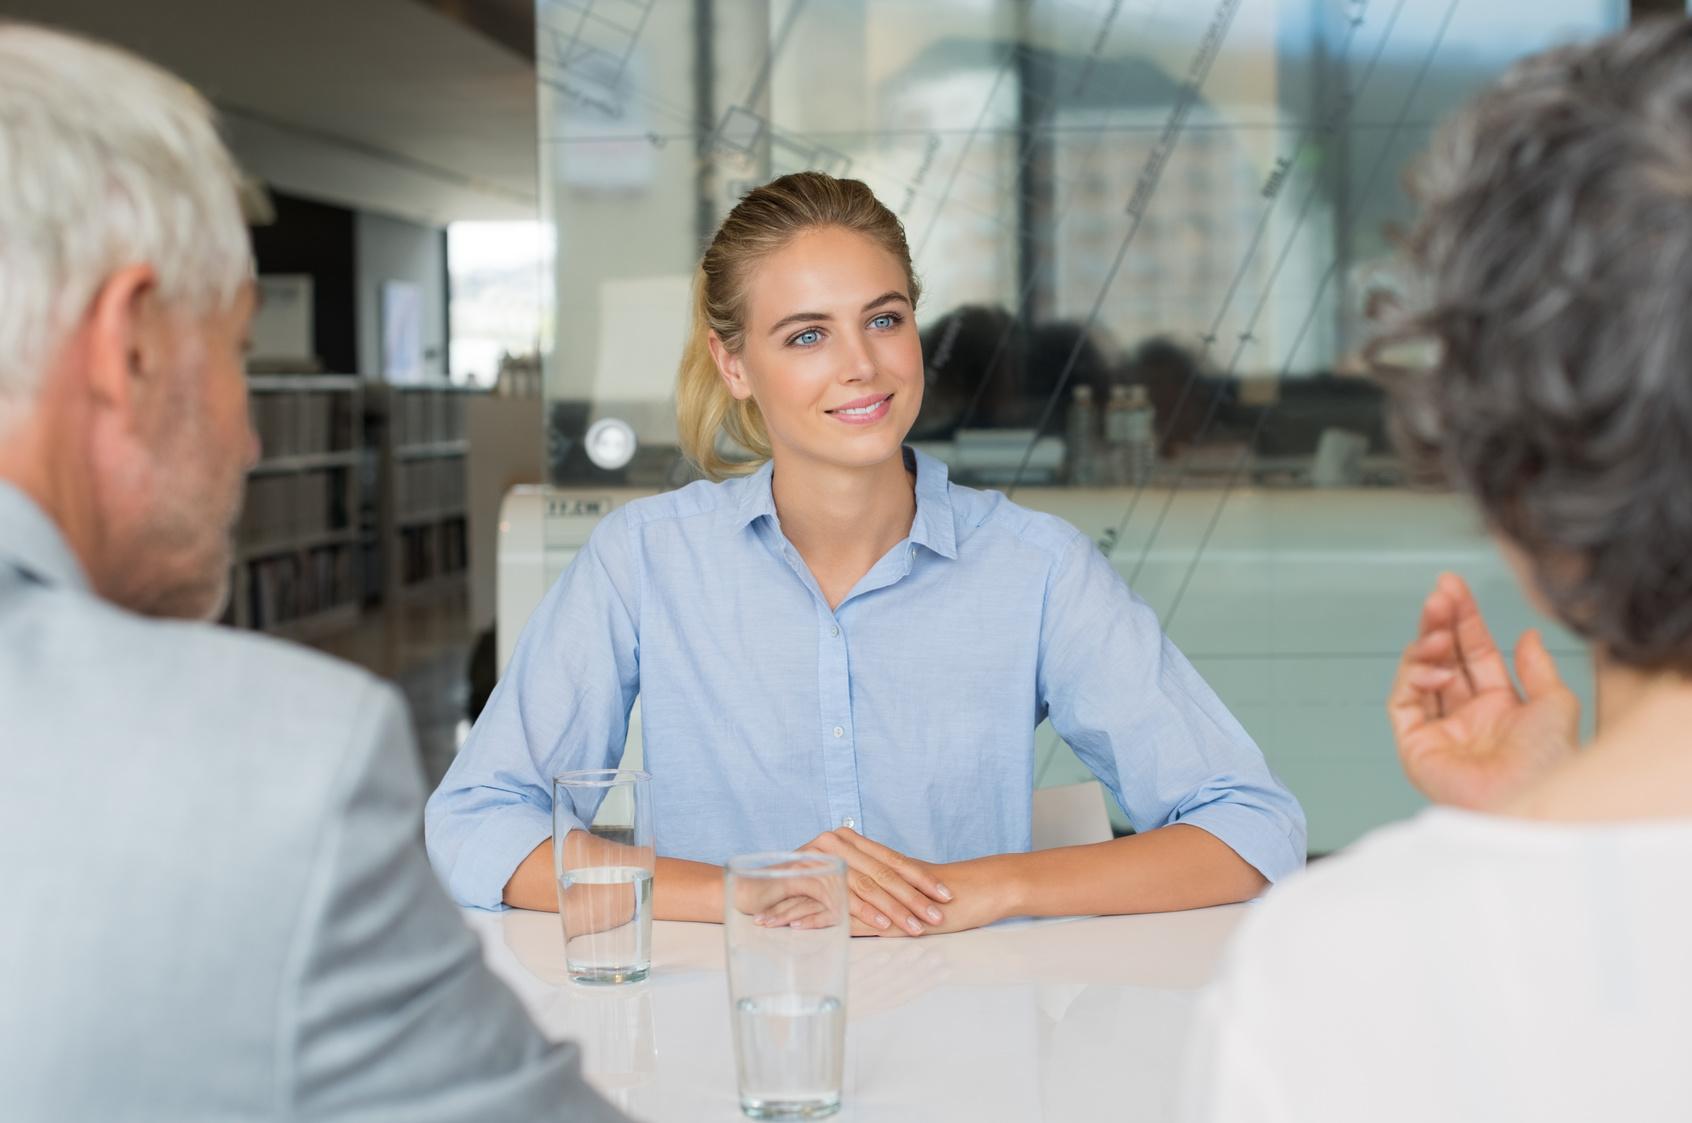 women in job interview conversation